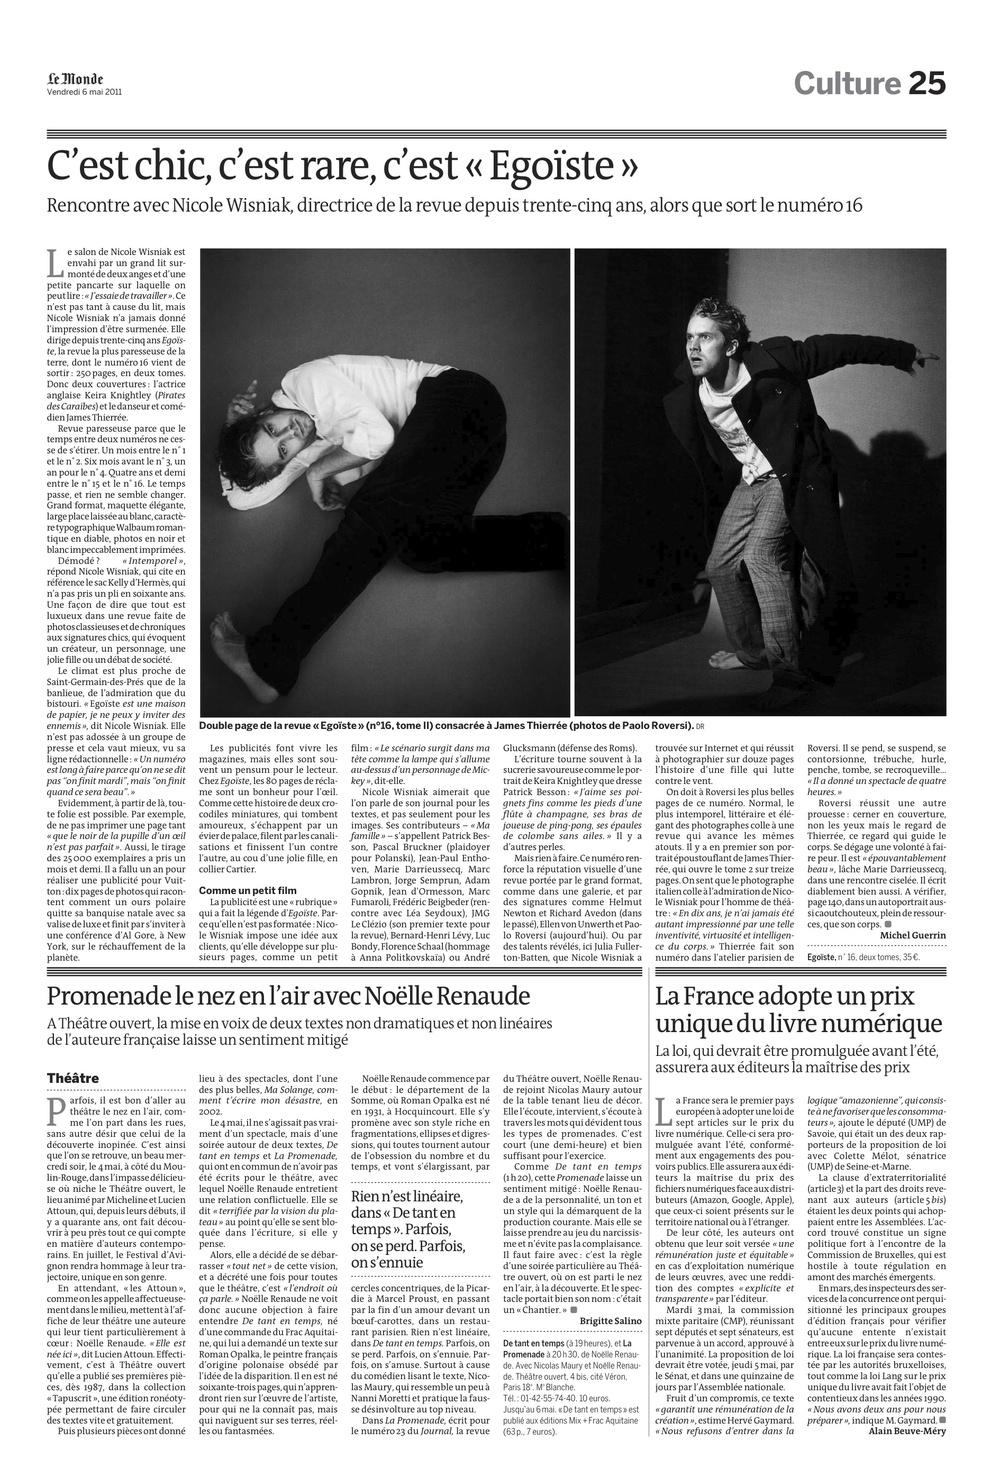 Le Monde 06 05 2011.jpg